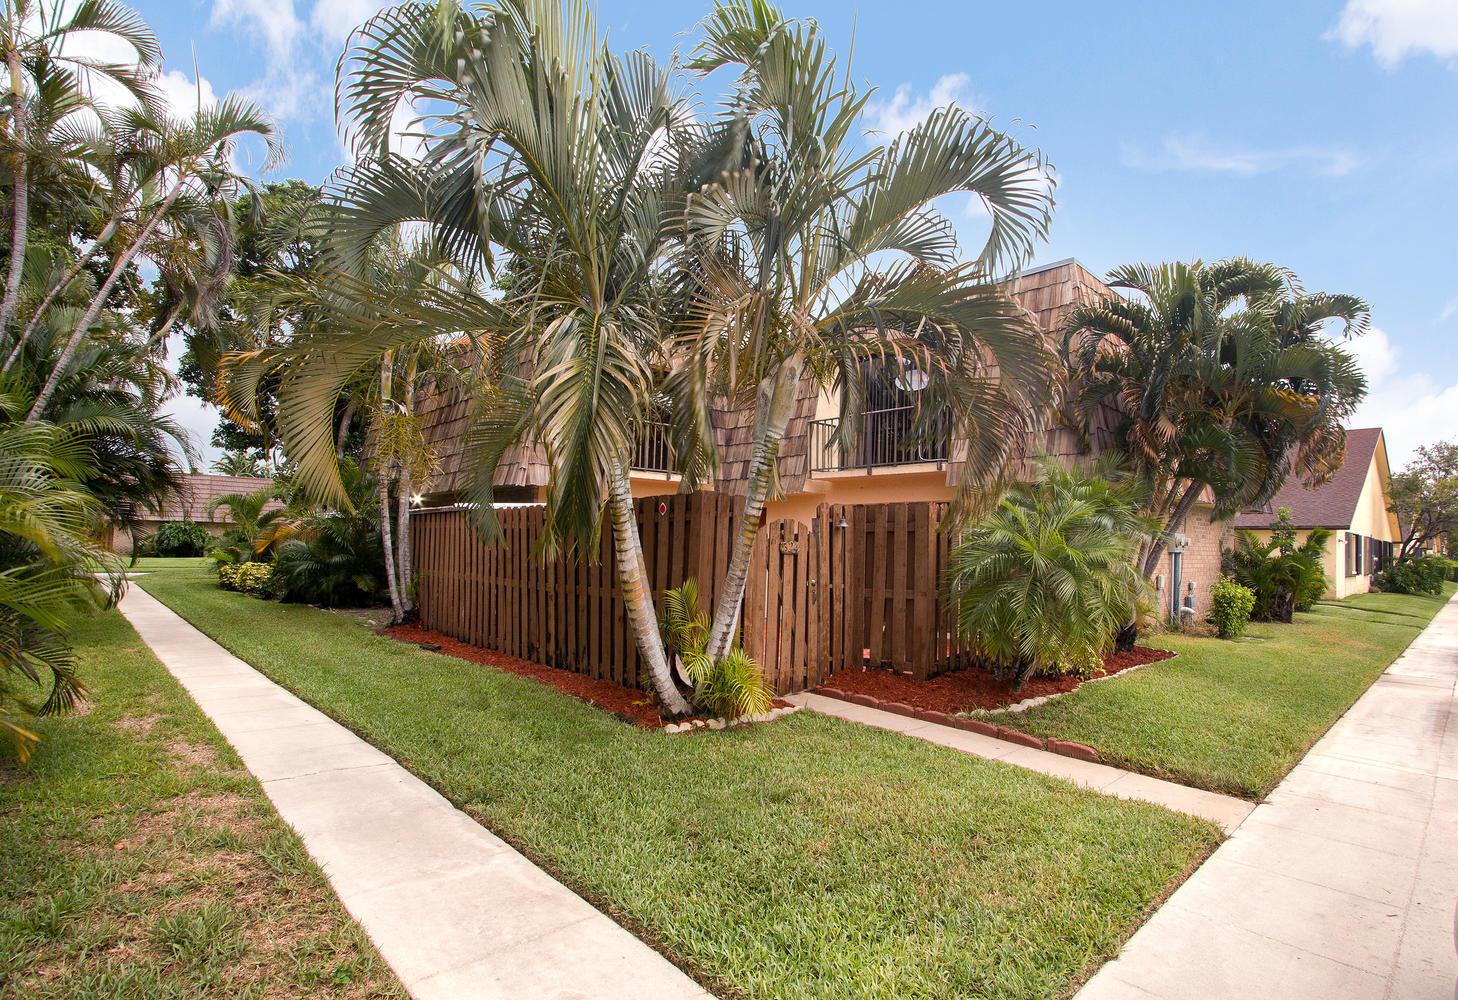 524 Springdale Circle - Palm Springs, Florida